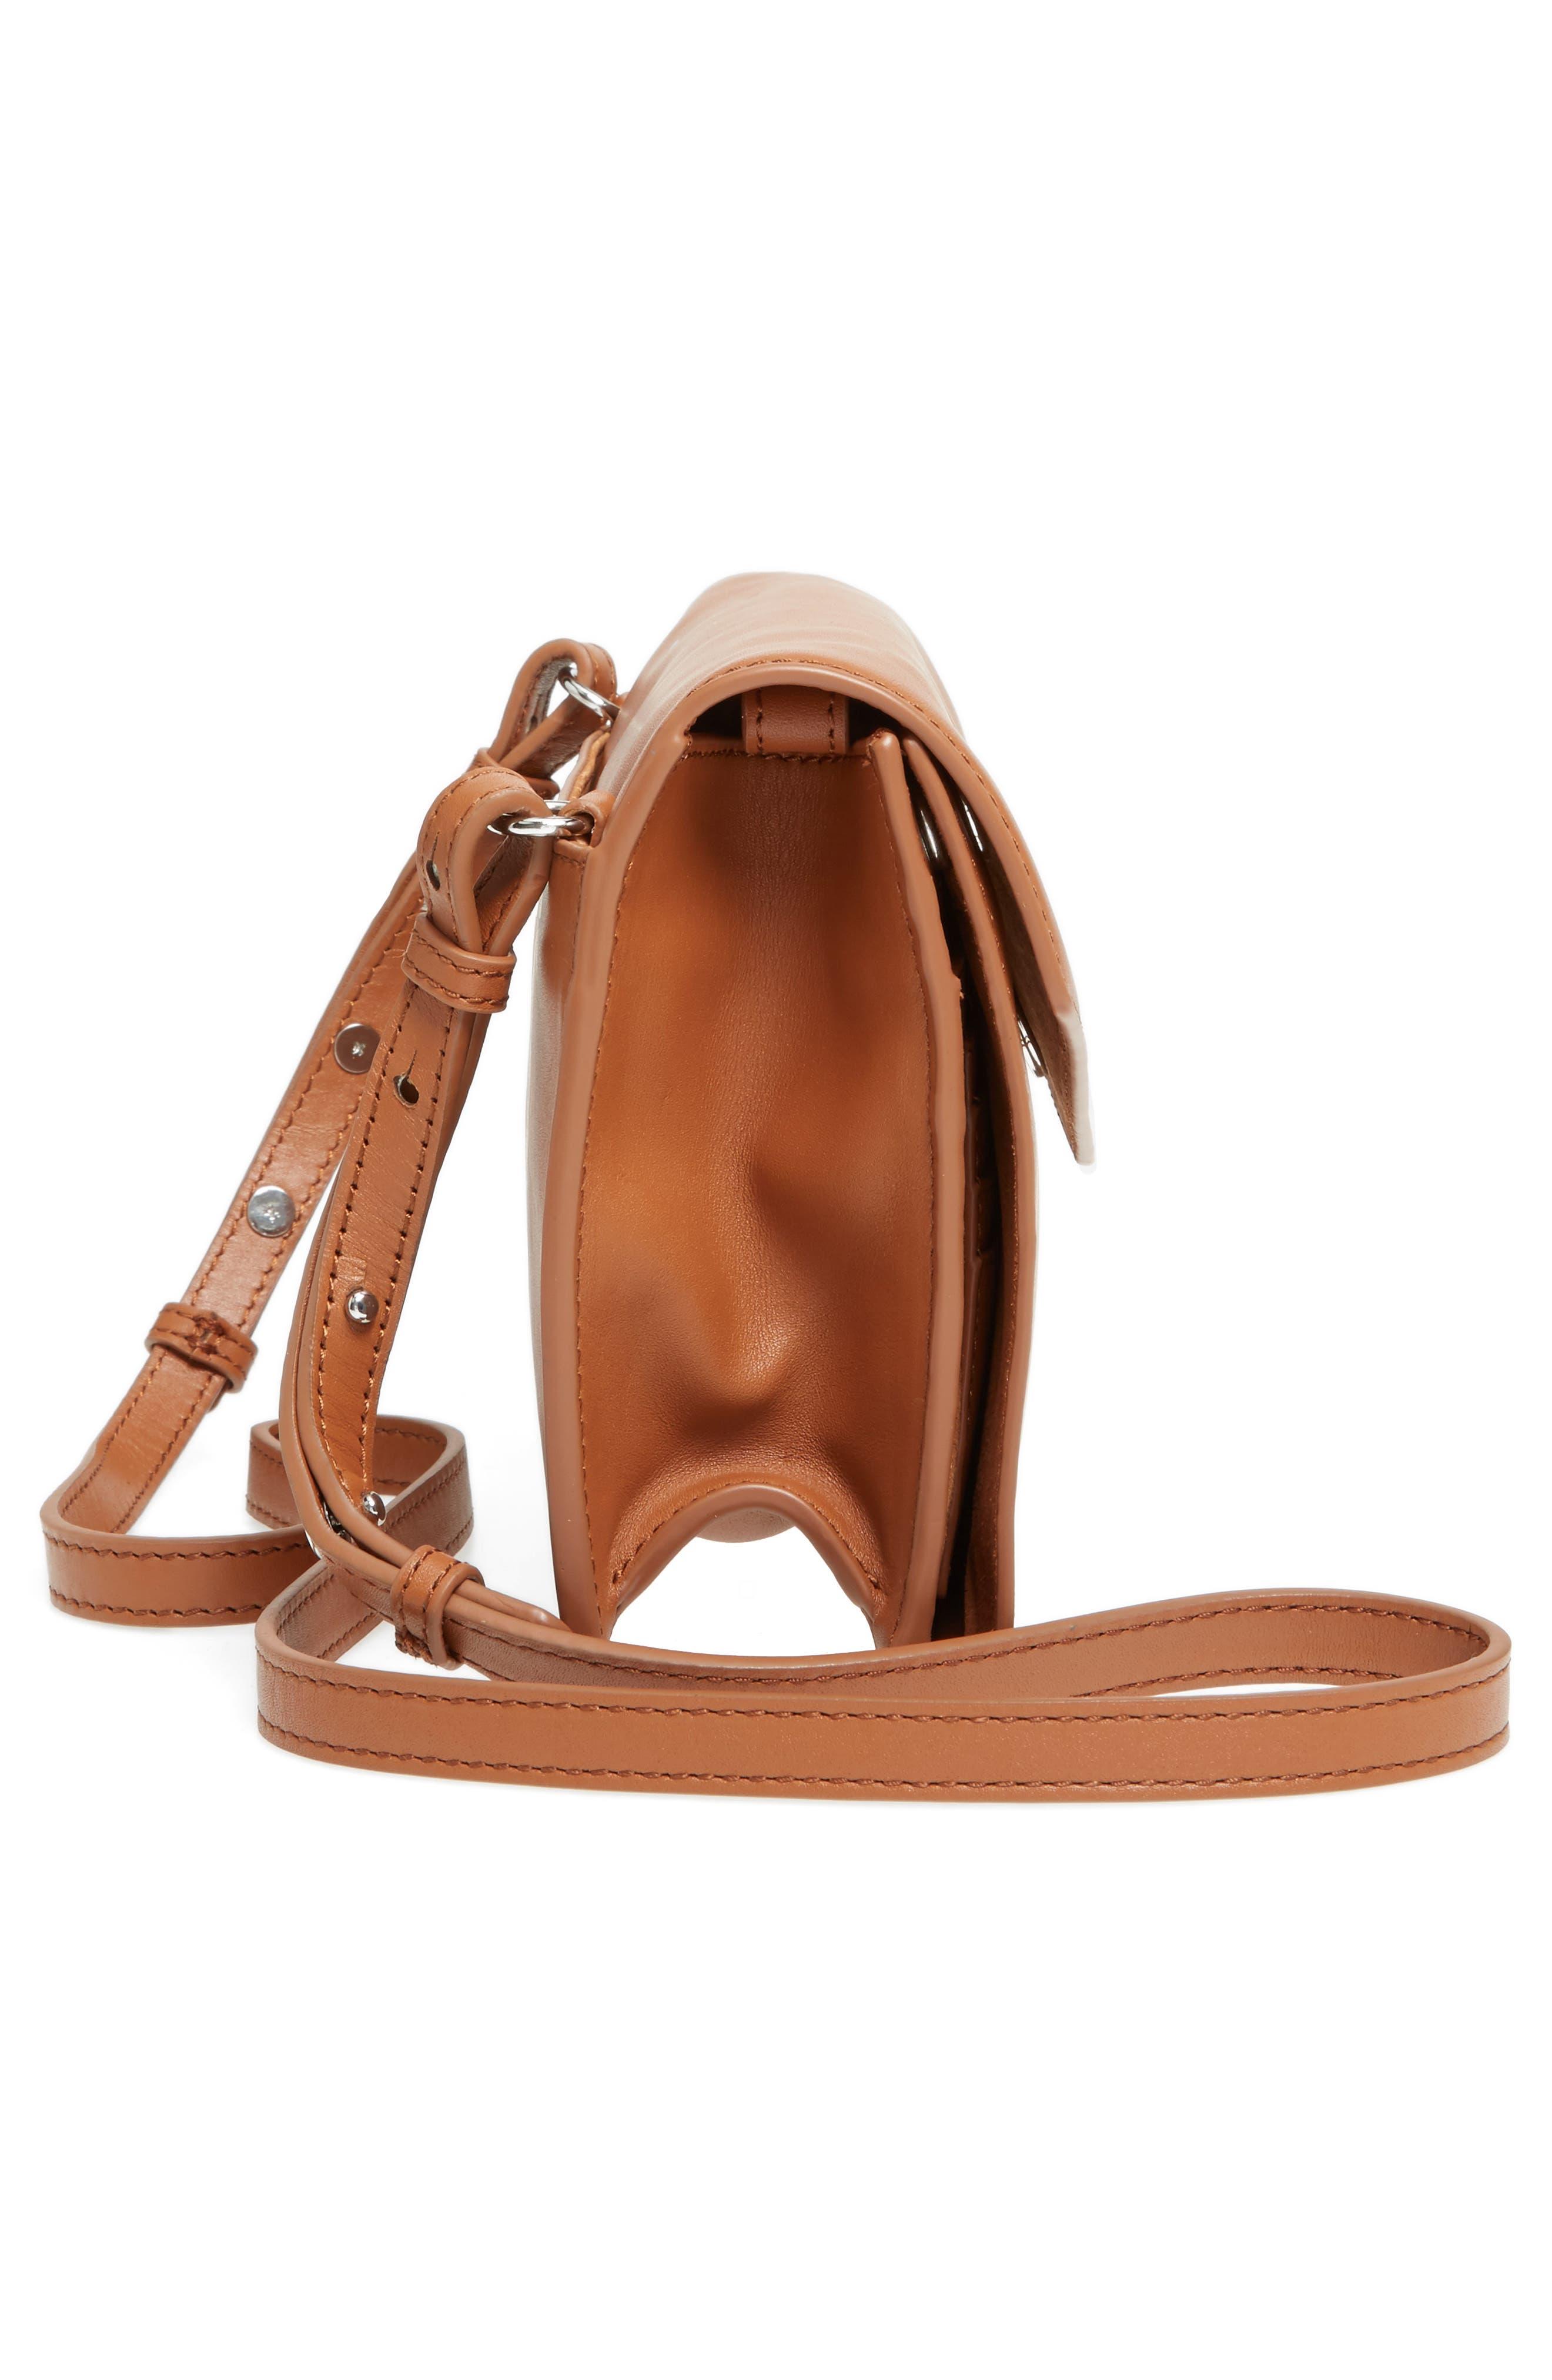 Easton Leather Envelope Crossbody Bag,                             Alternate thumbnail 5, color,                             200